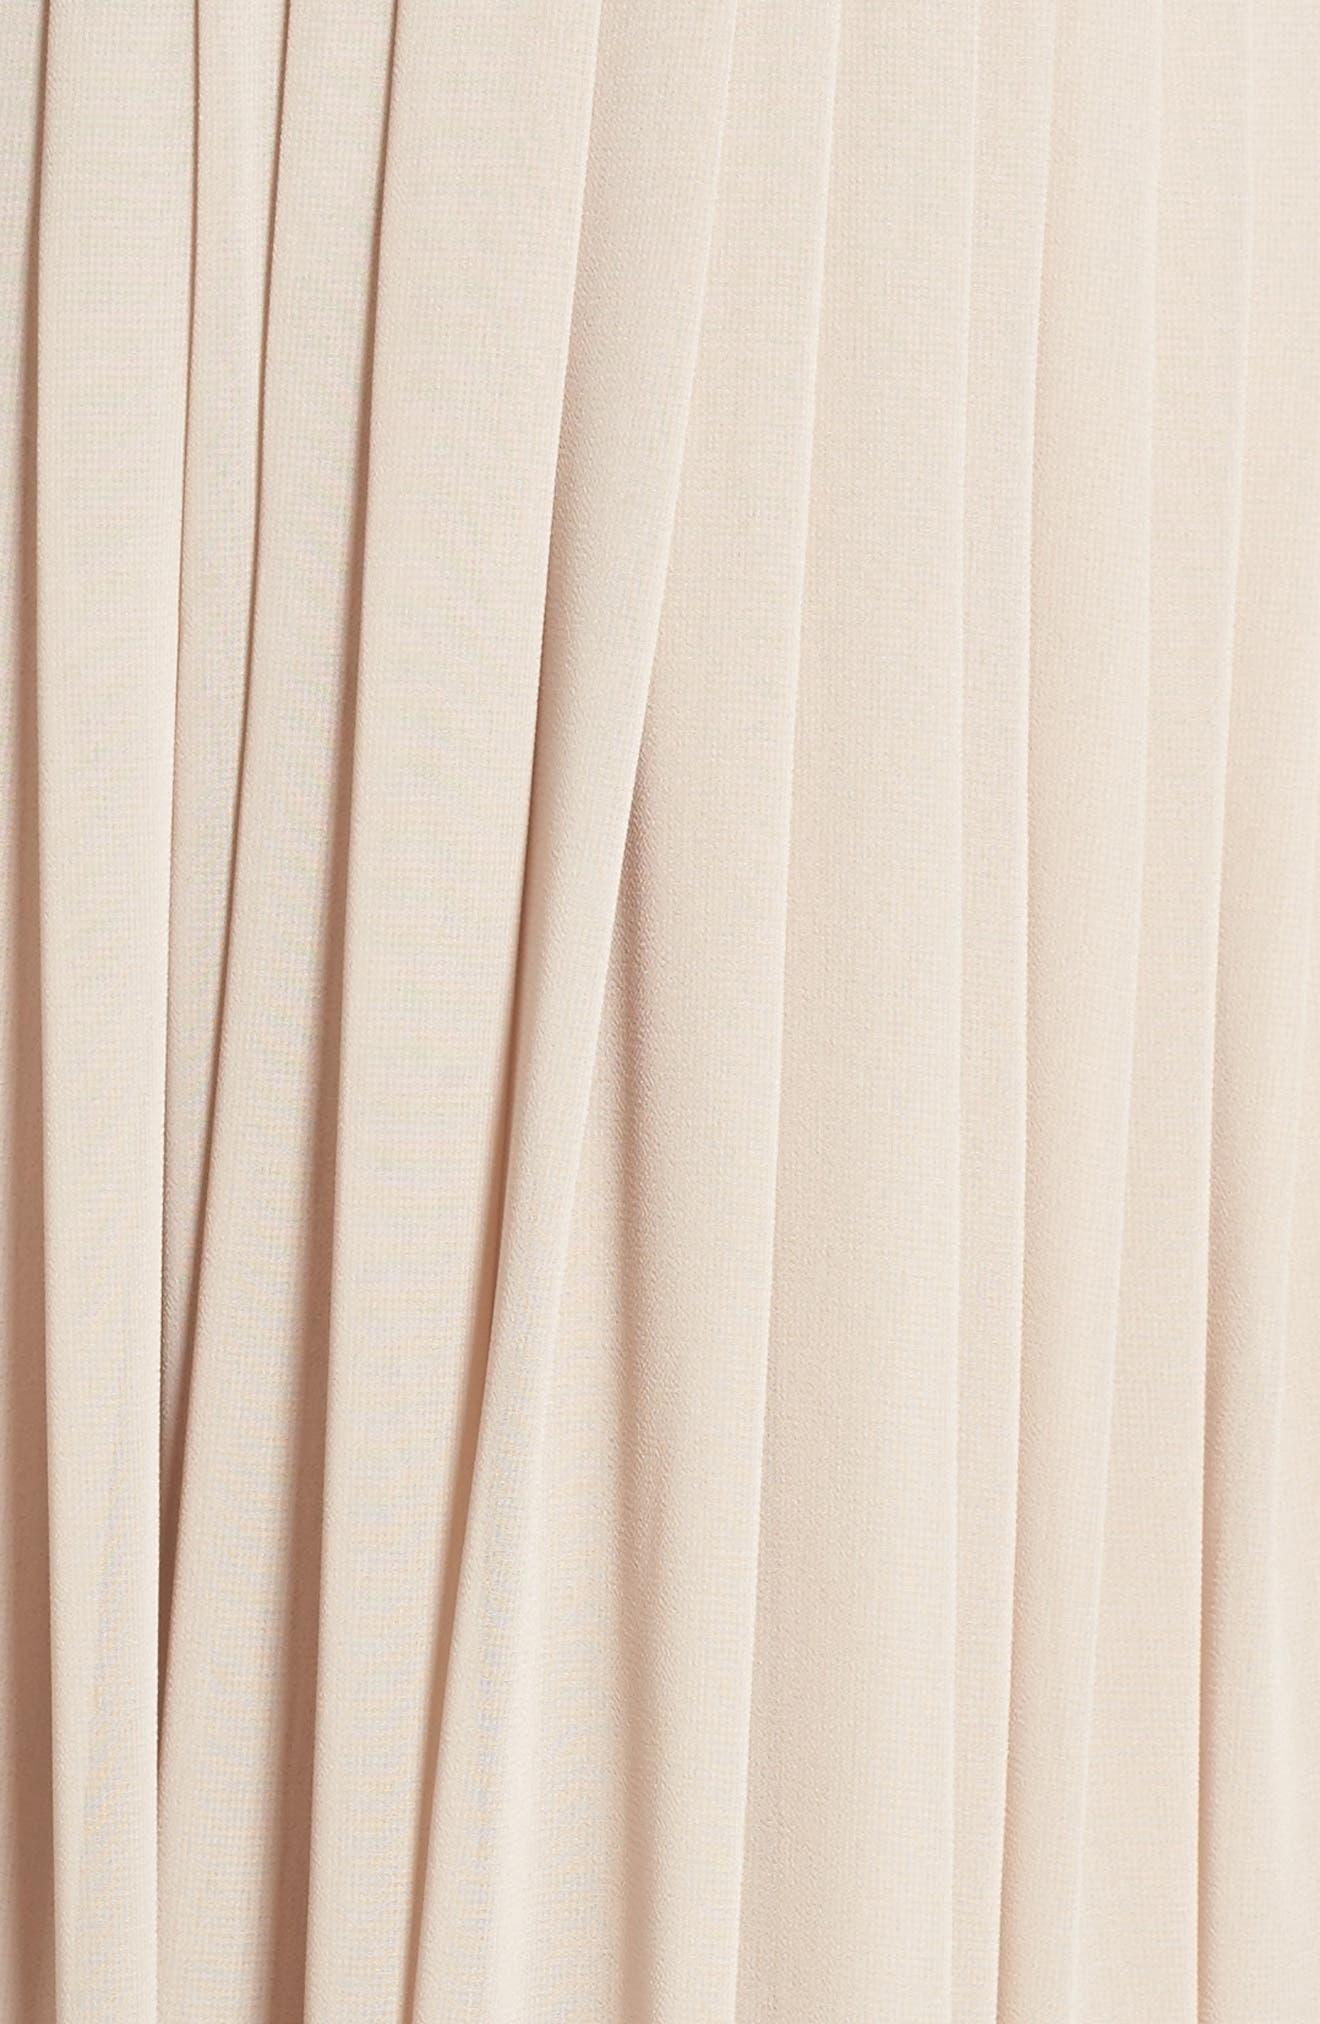 Deep V-Neck Ruffle Pleat Chiffon Gown,                             Alternate thumbnail 29, color,